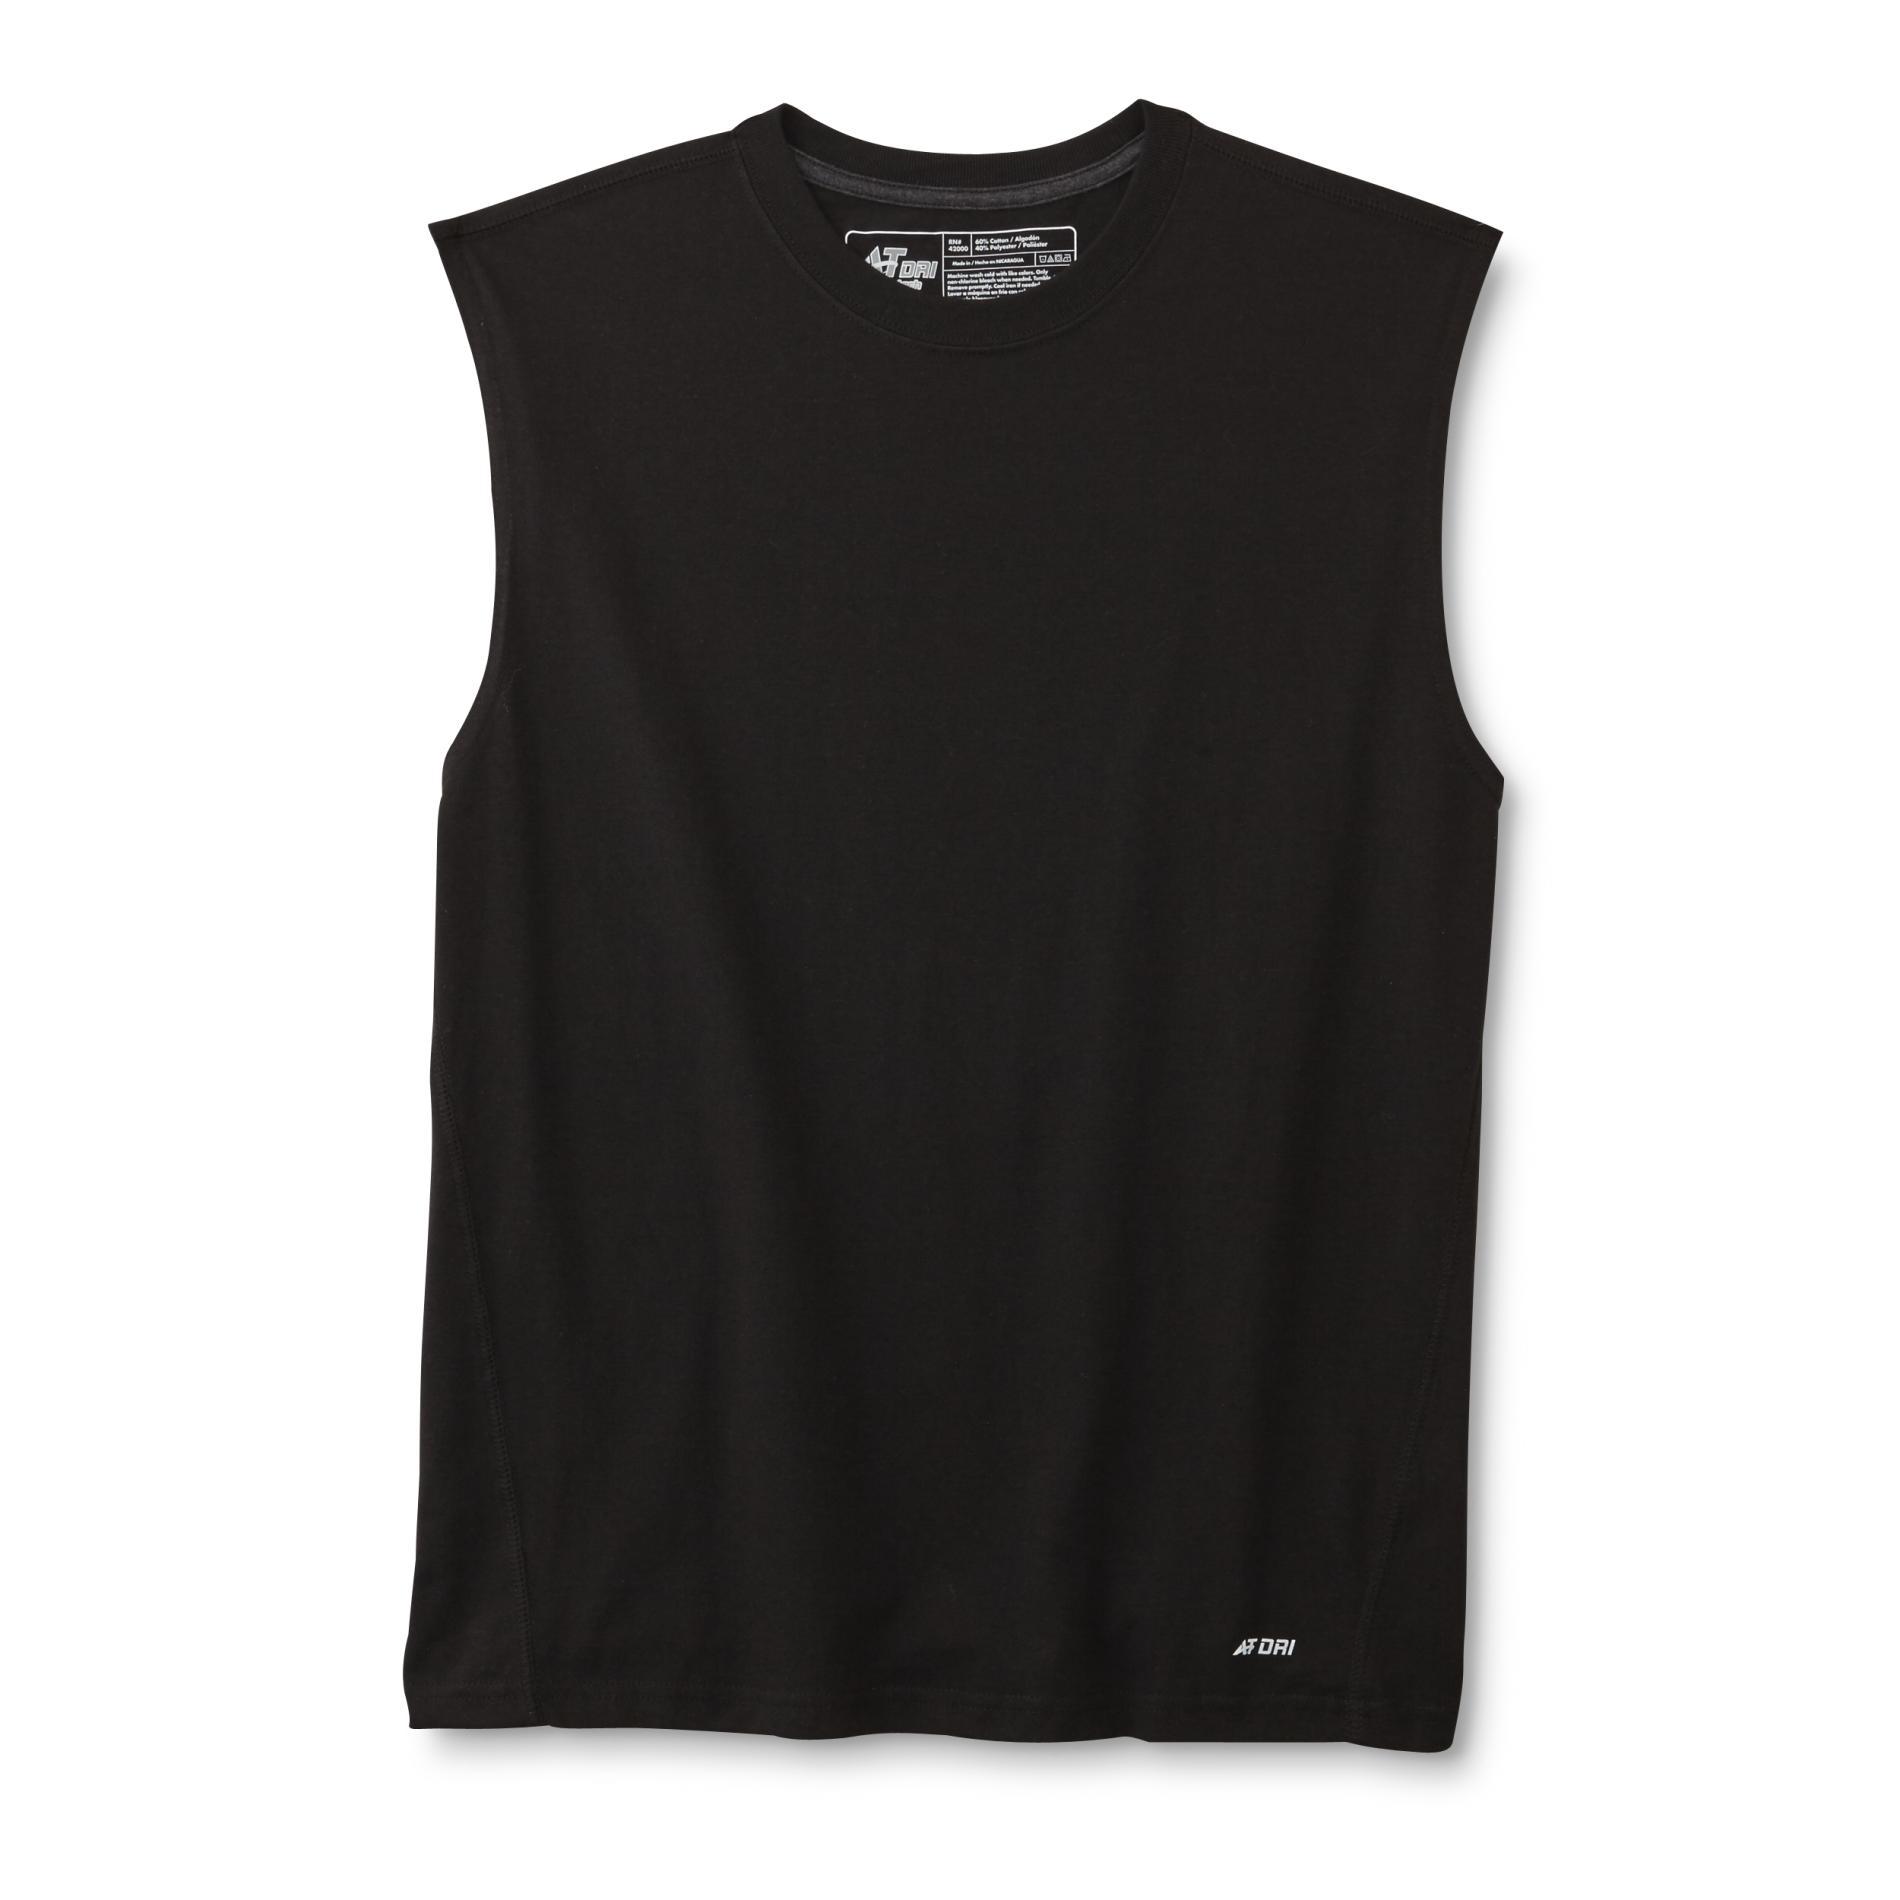 Men's Big & Tall Muscle Shirt